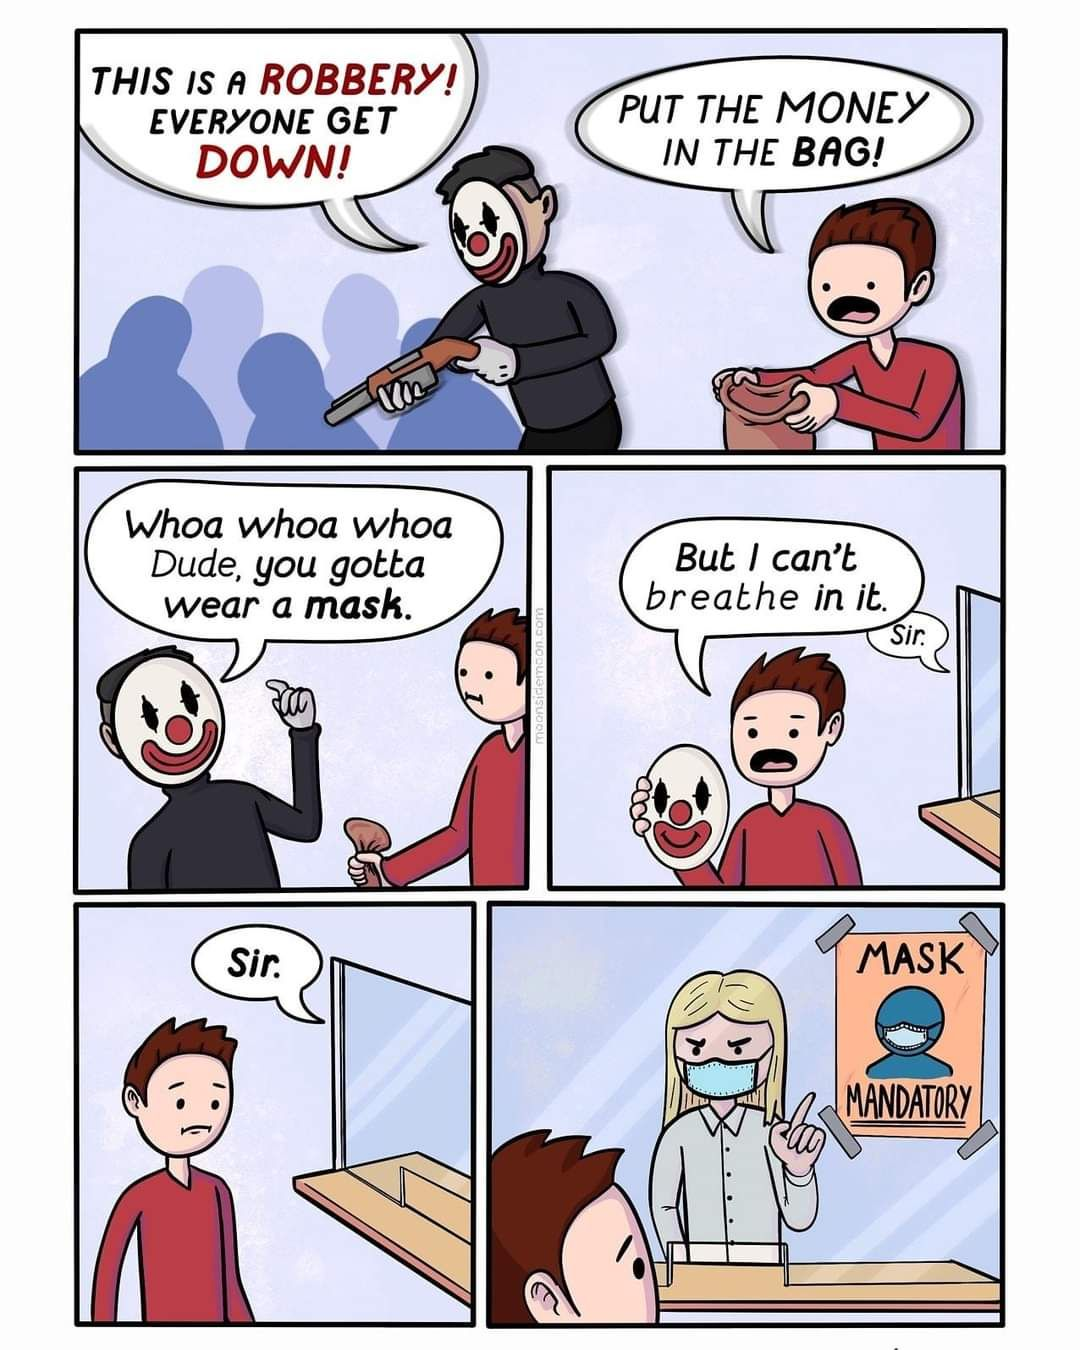 Wear mask everyone